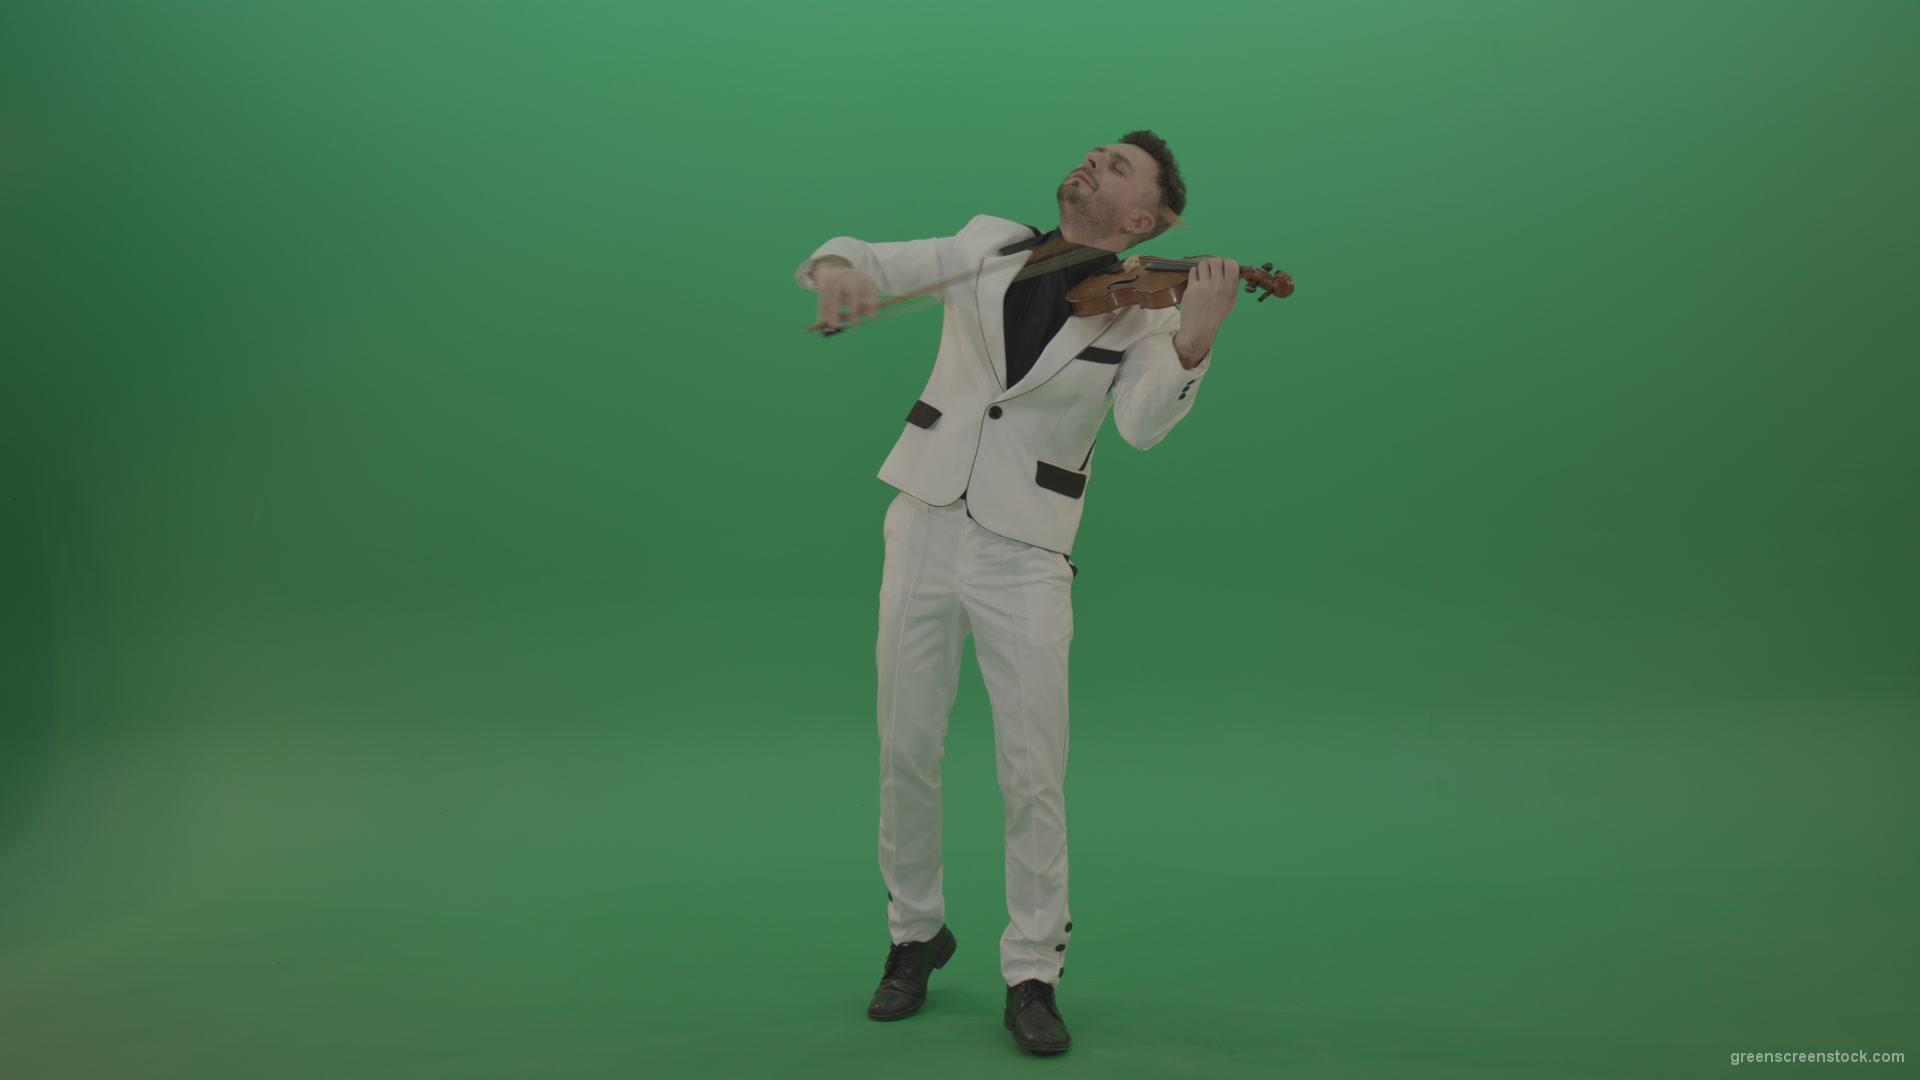 Music Green Screen Footage